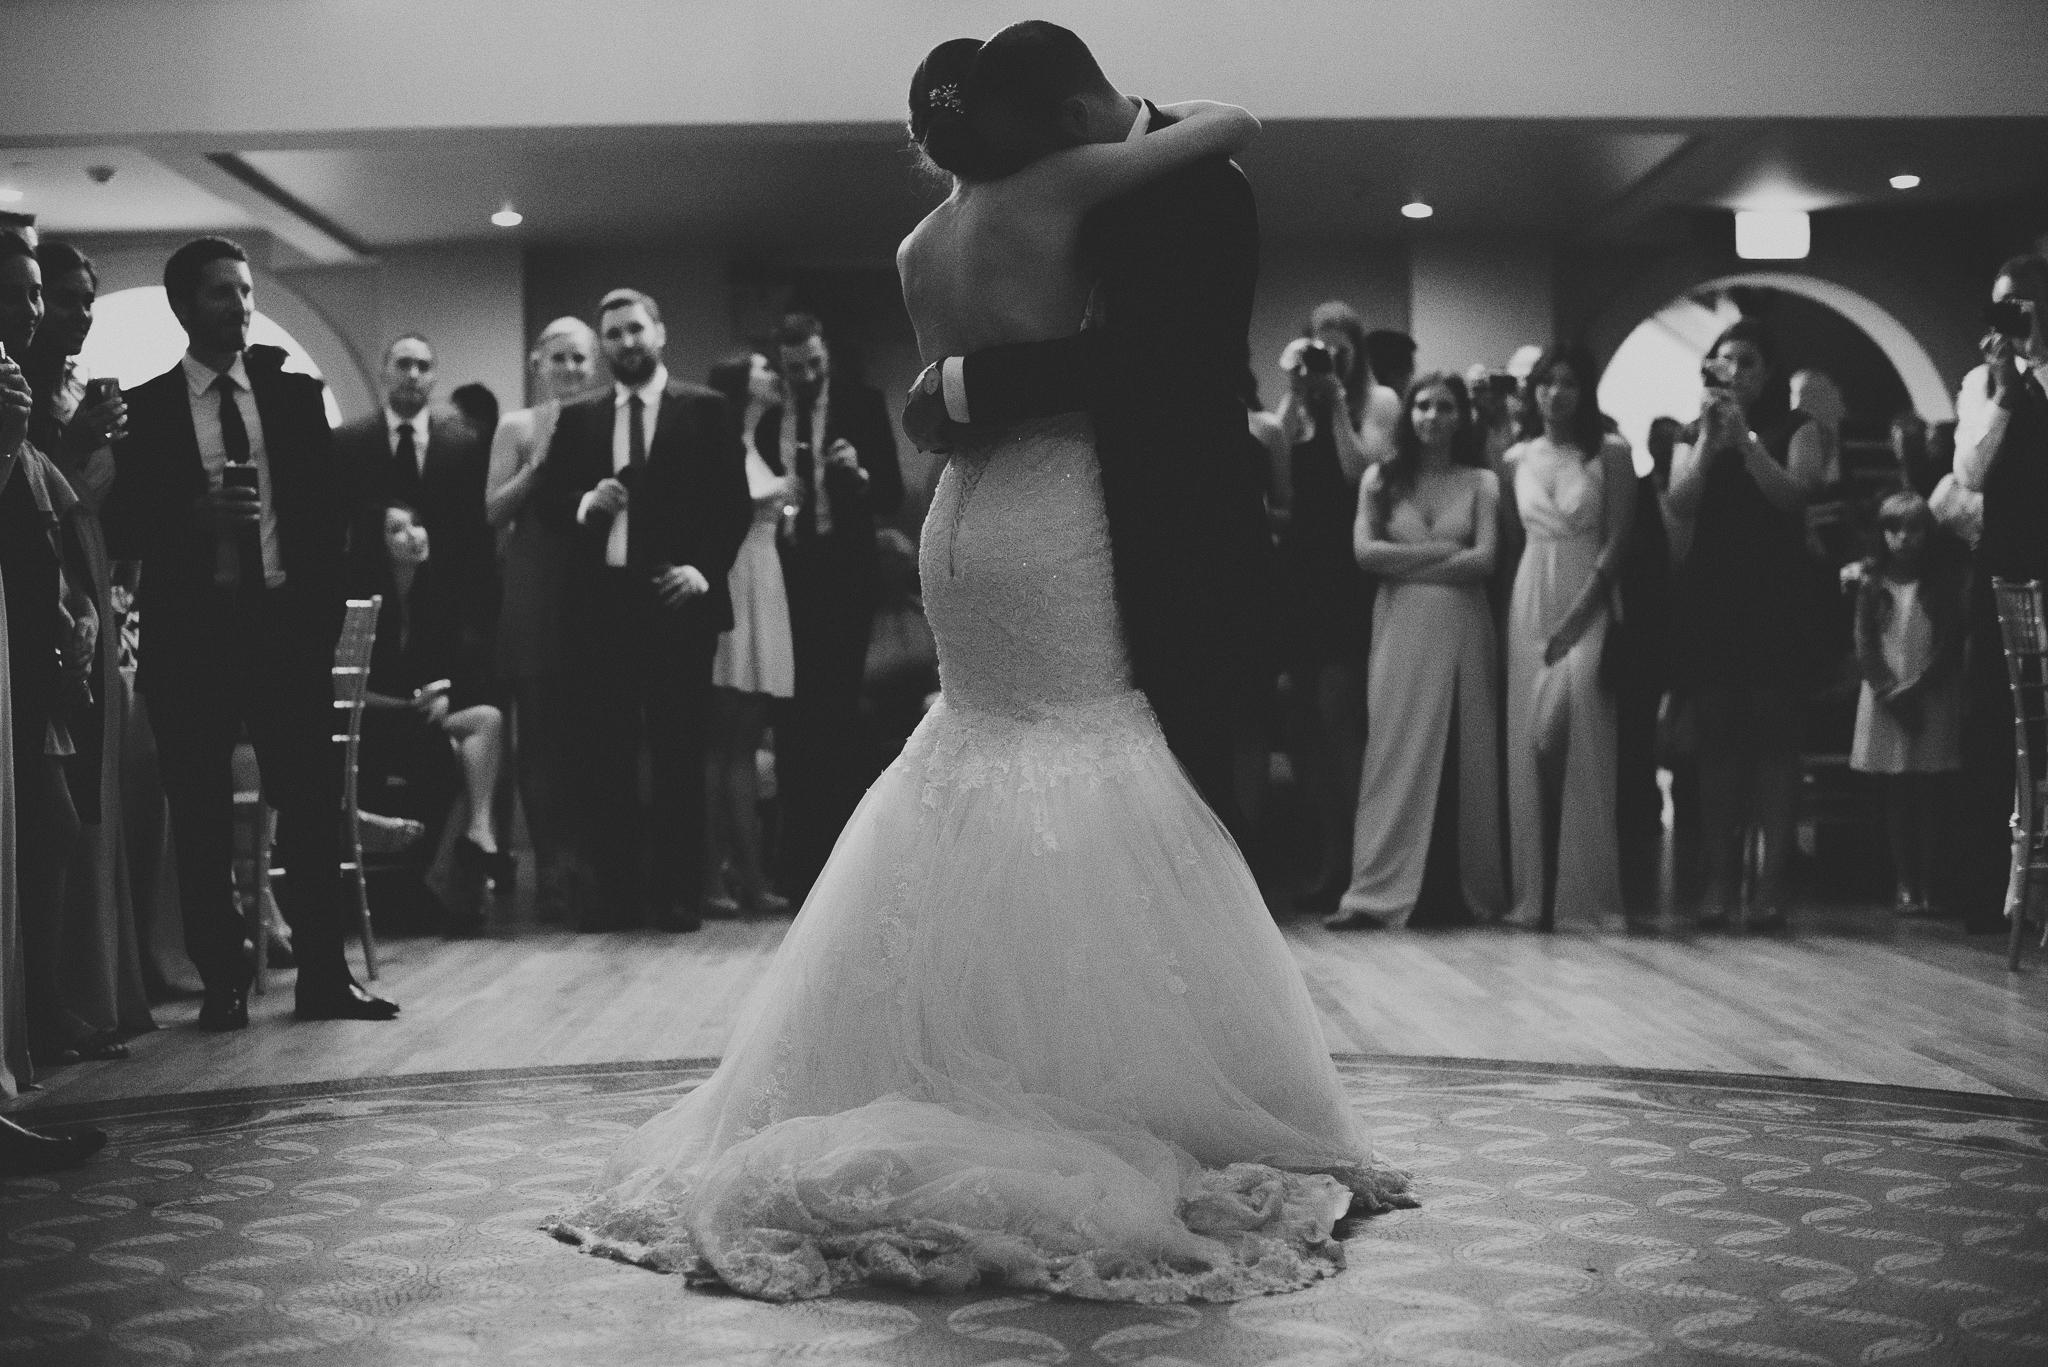 240-permanent-vancouver-wedding-courtneysteven-web-9504.jpg